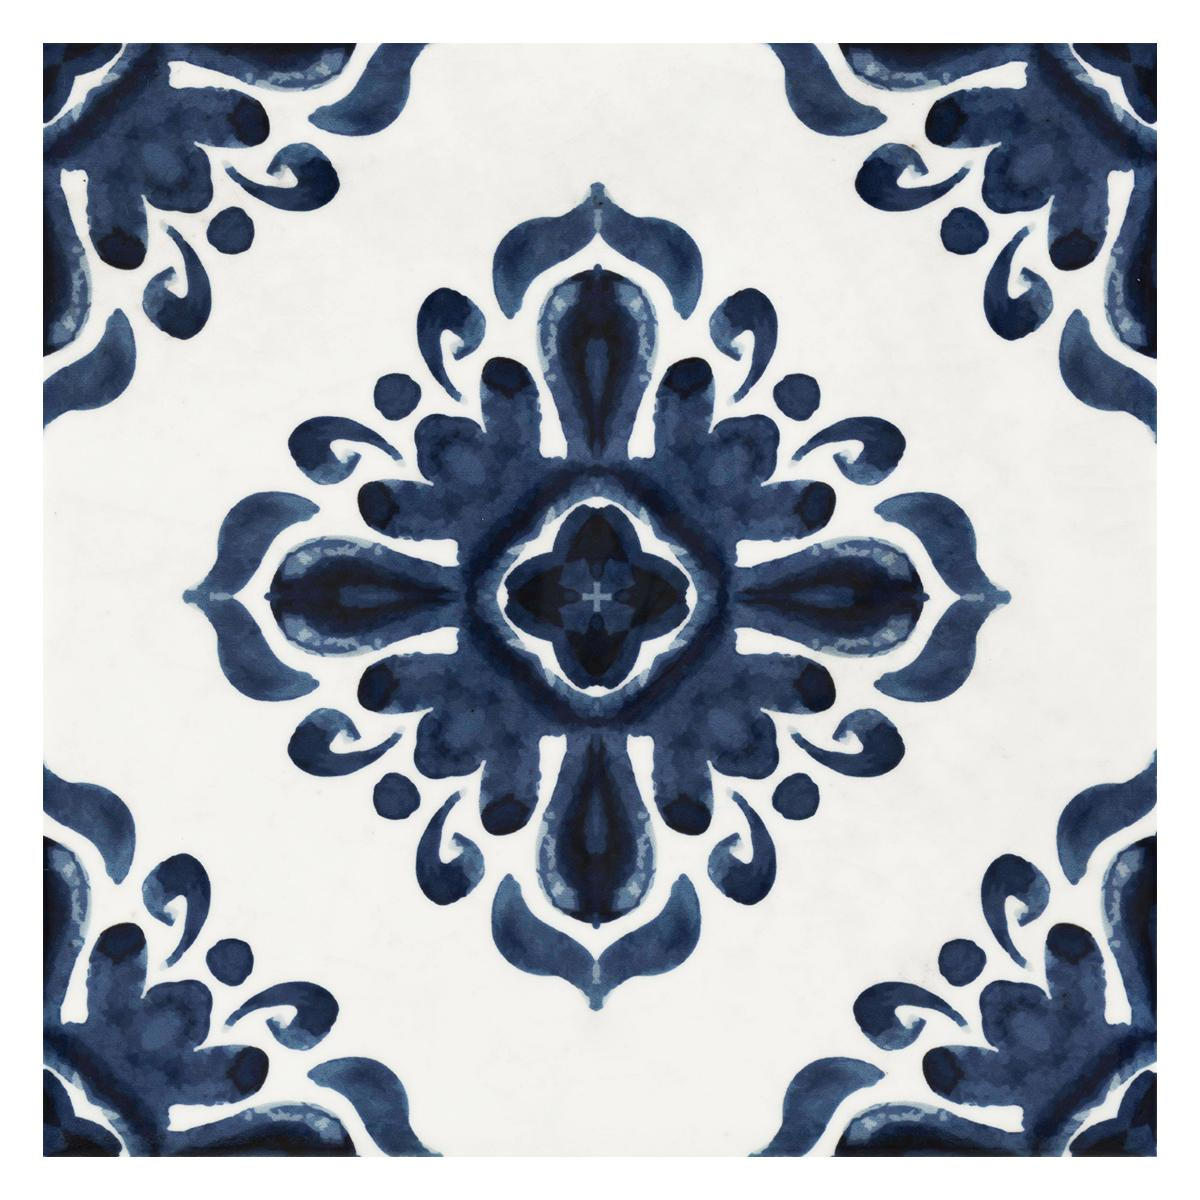 Mayólica Patch Blanco/Azul Brillante - 20X20 cm - 1.48 m2